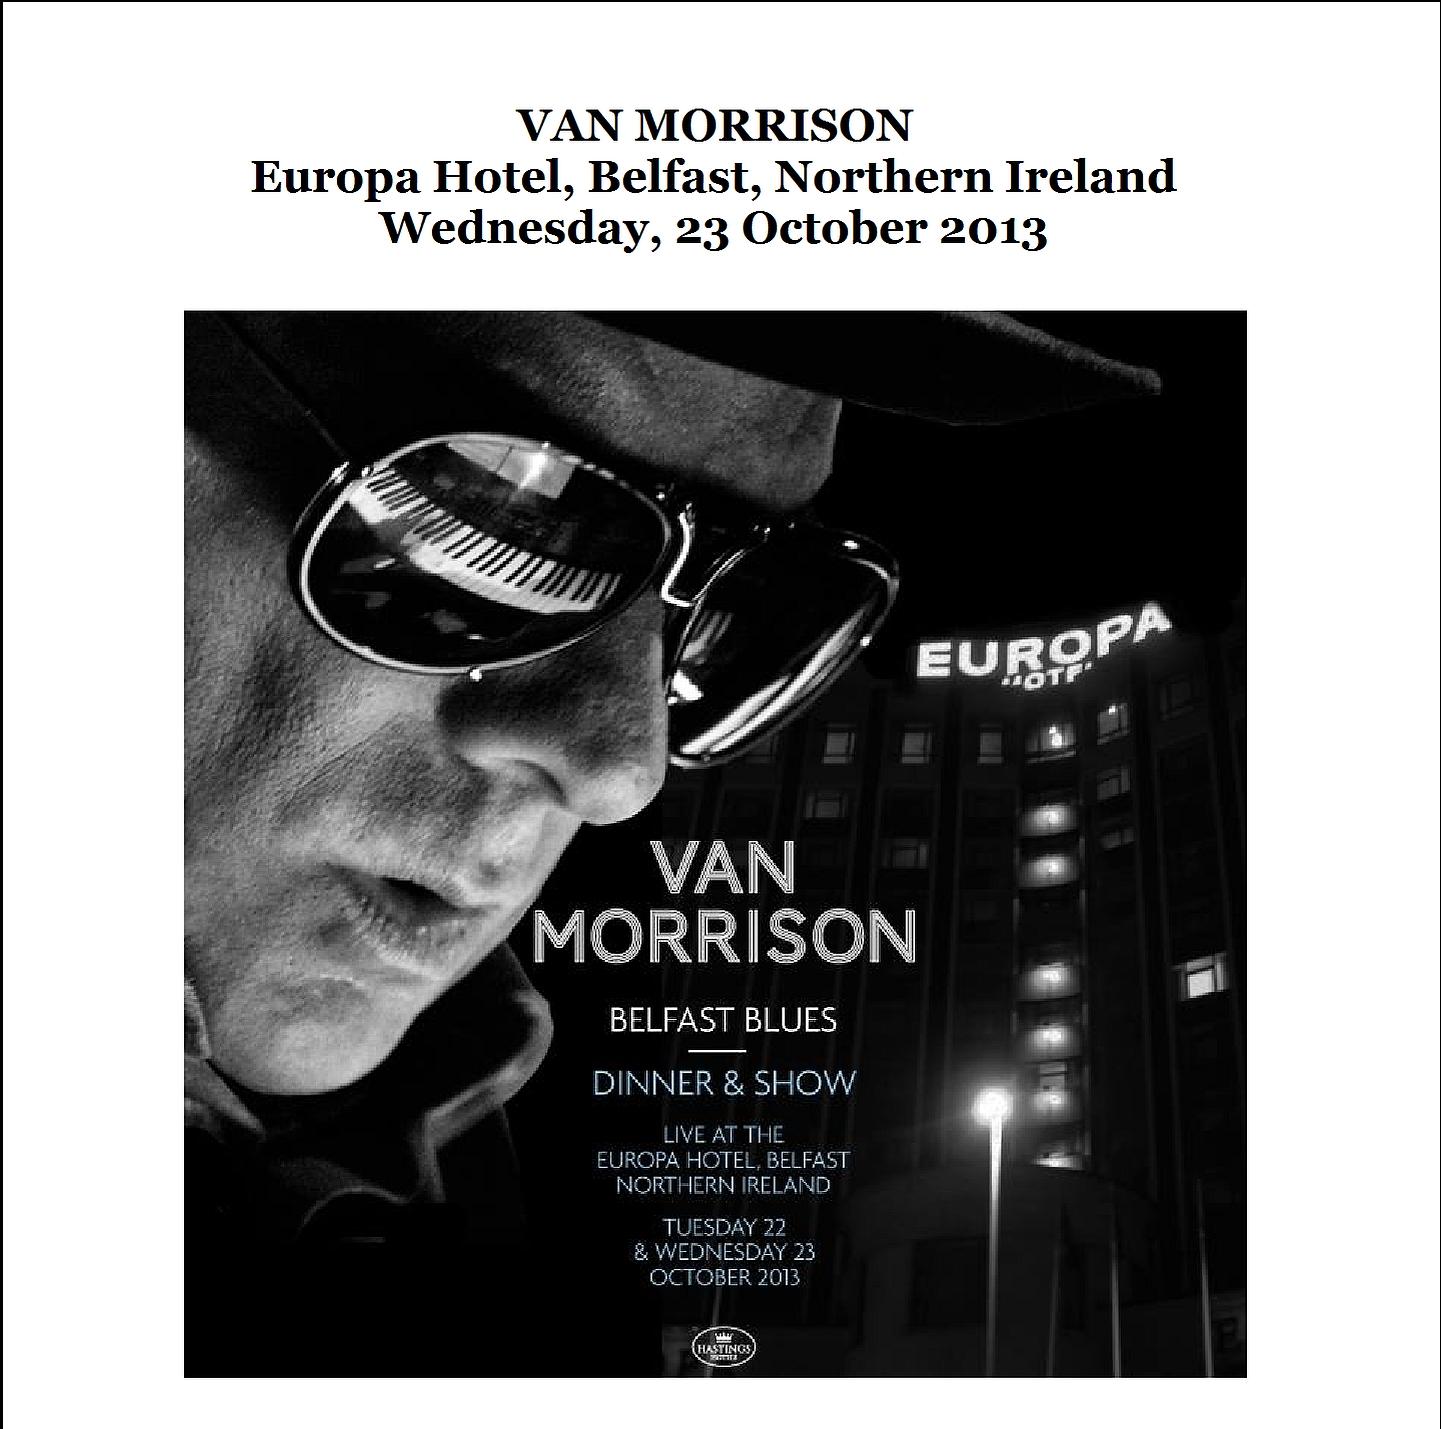 VanMorrison2013-10-23EuropaHotelBelfastNorthernIreland.jpg